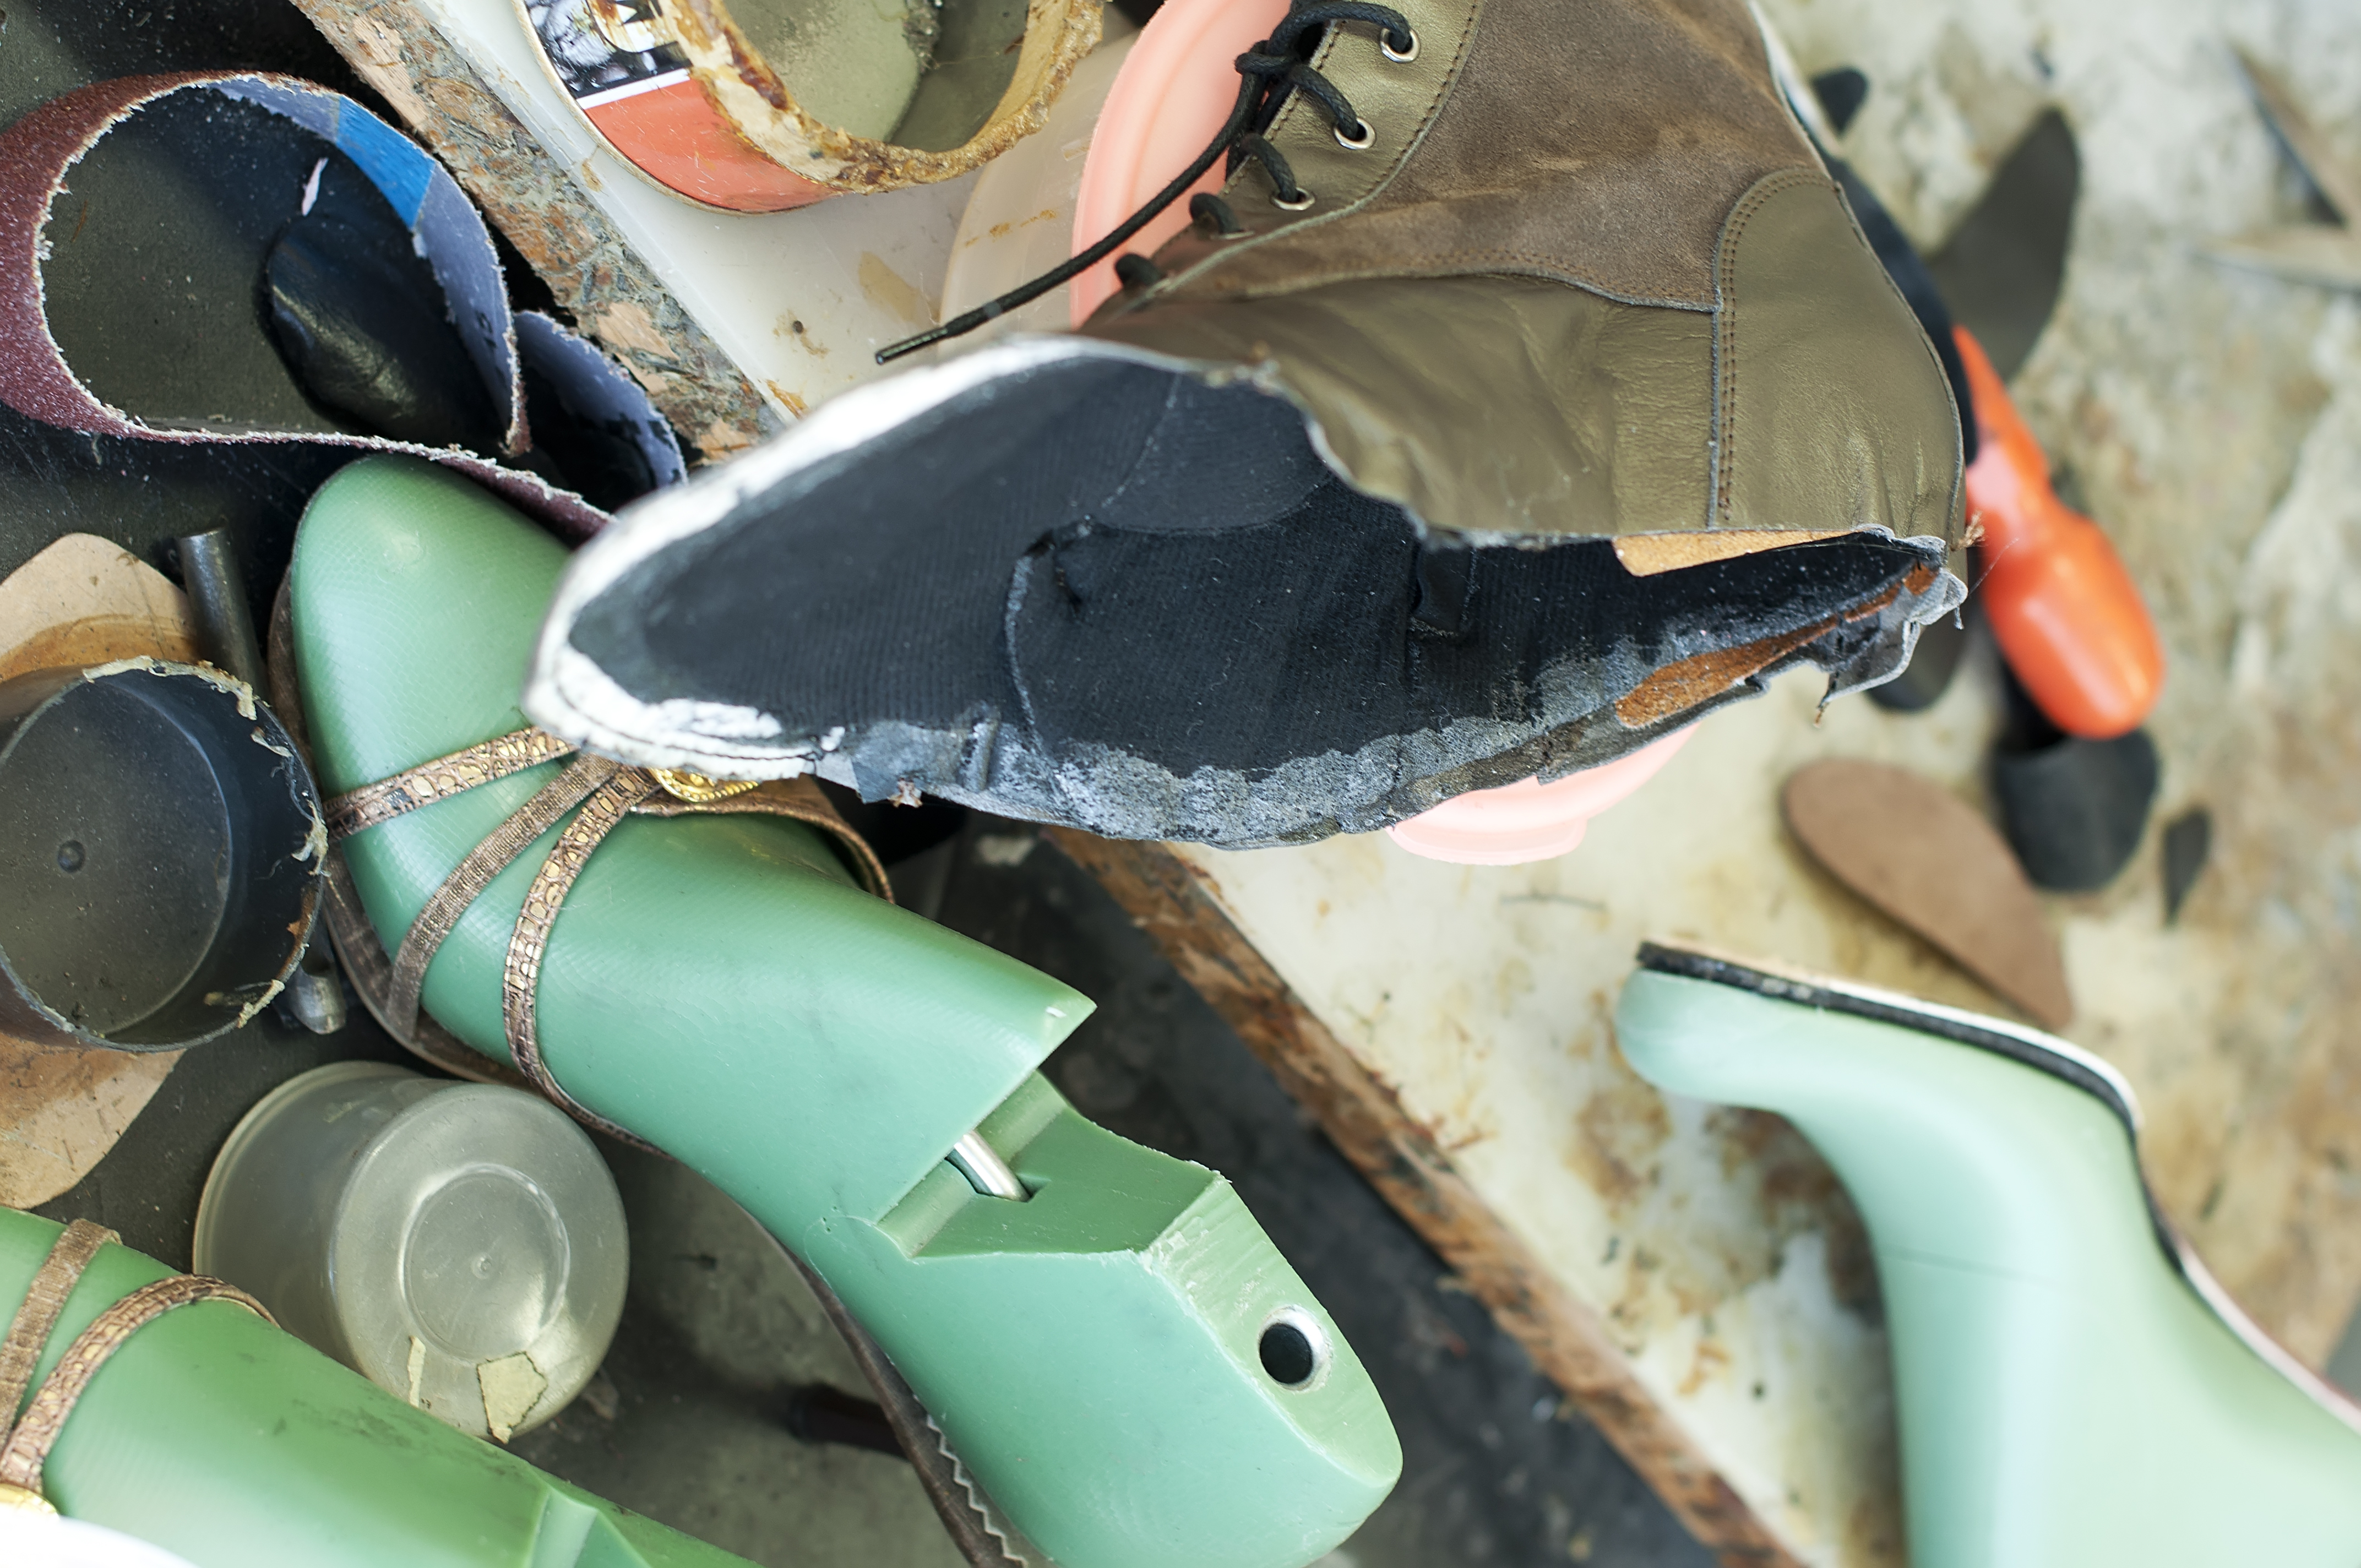 Equipment for home-based shoemaking